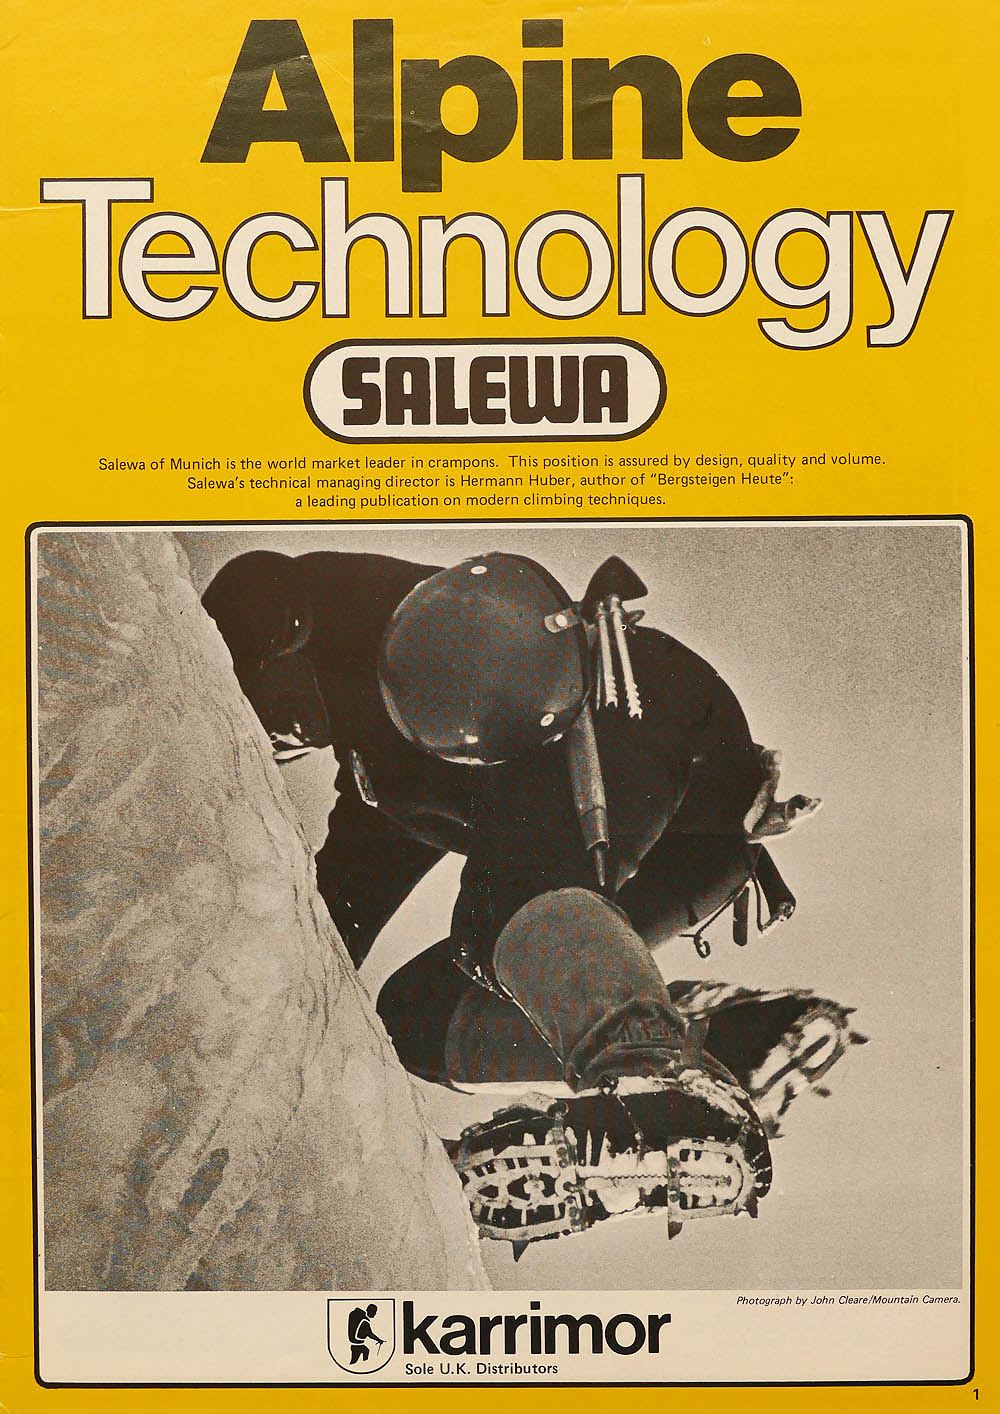 Karrimor alpine Technology